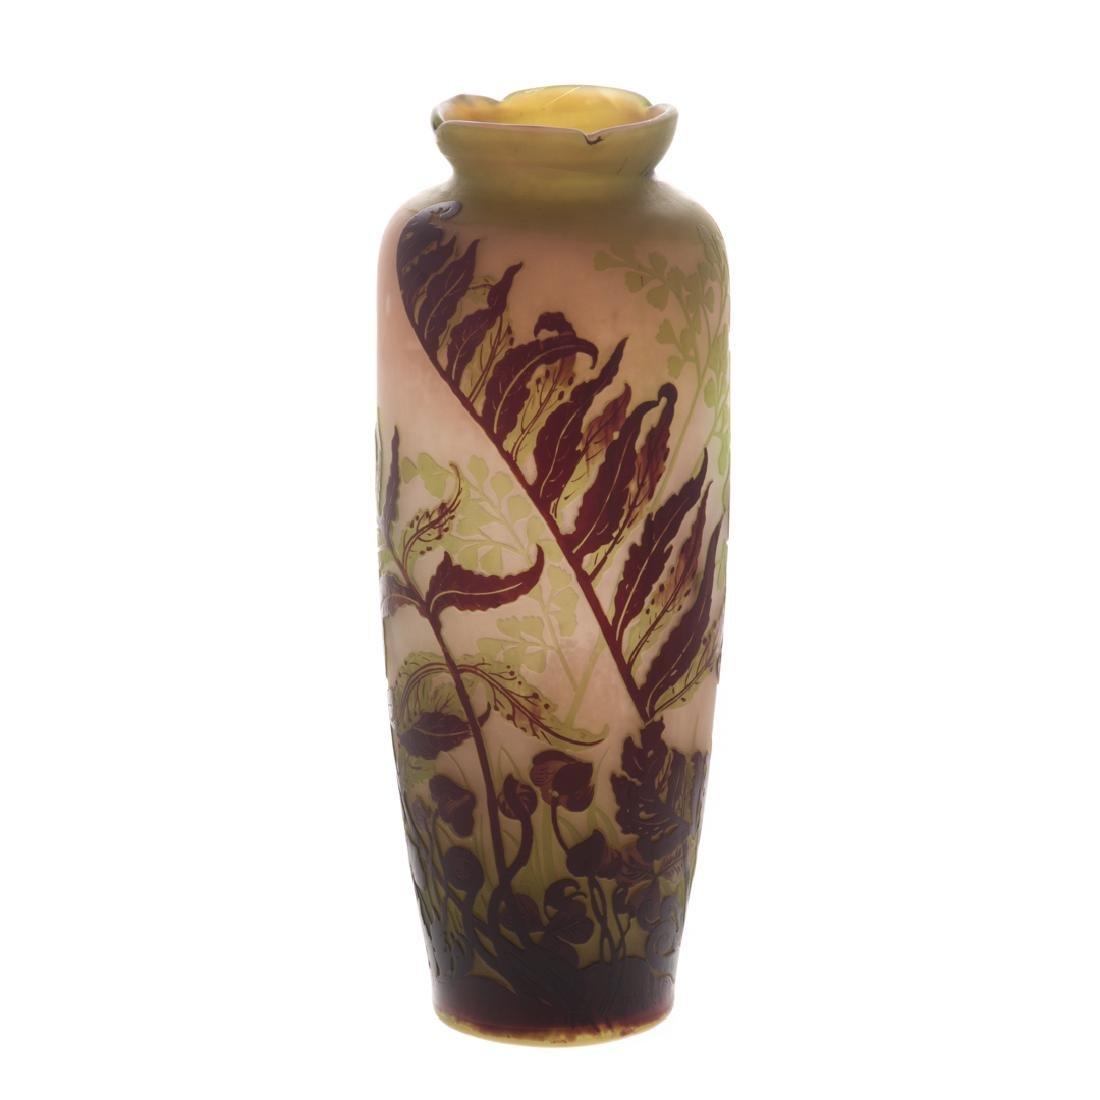 Emile Galle acid etched cameo glass vase